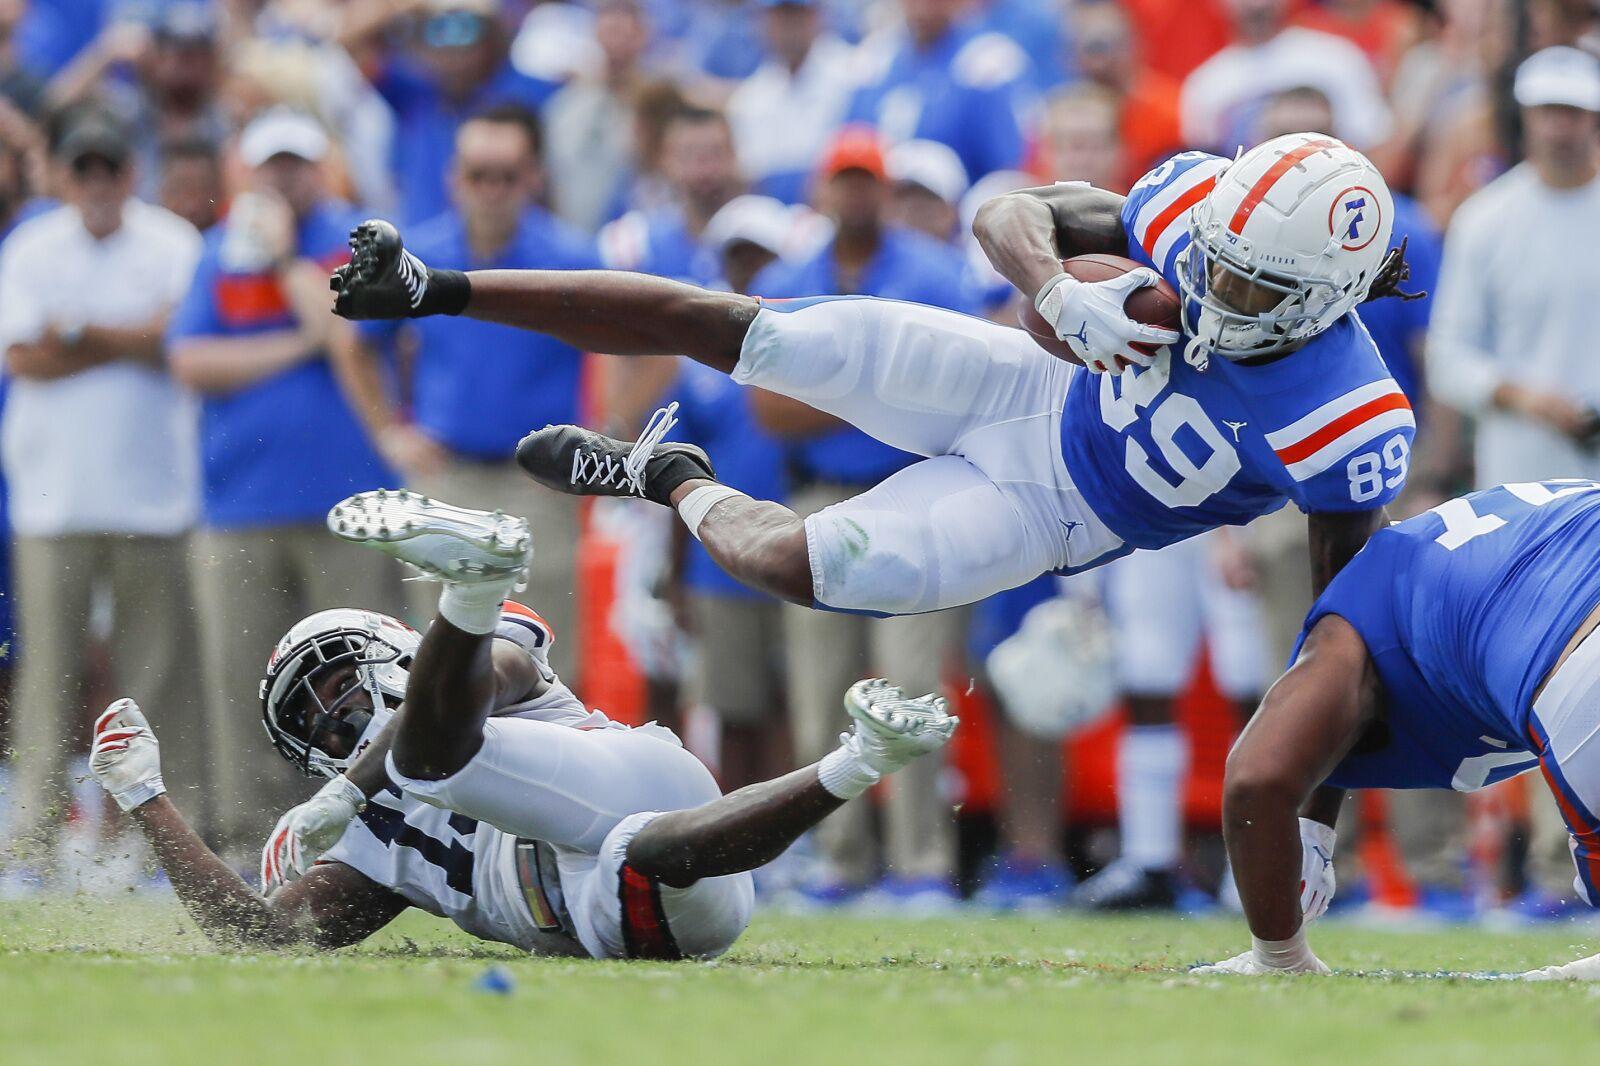 Florida football: How to bet Week 7 at LSU